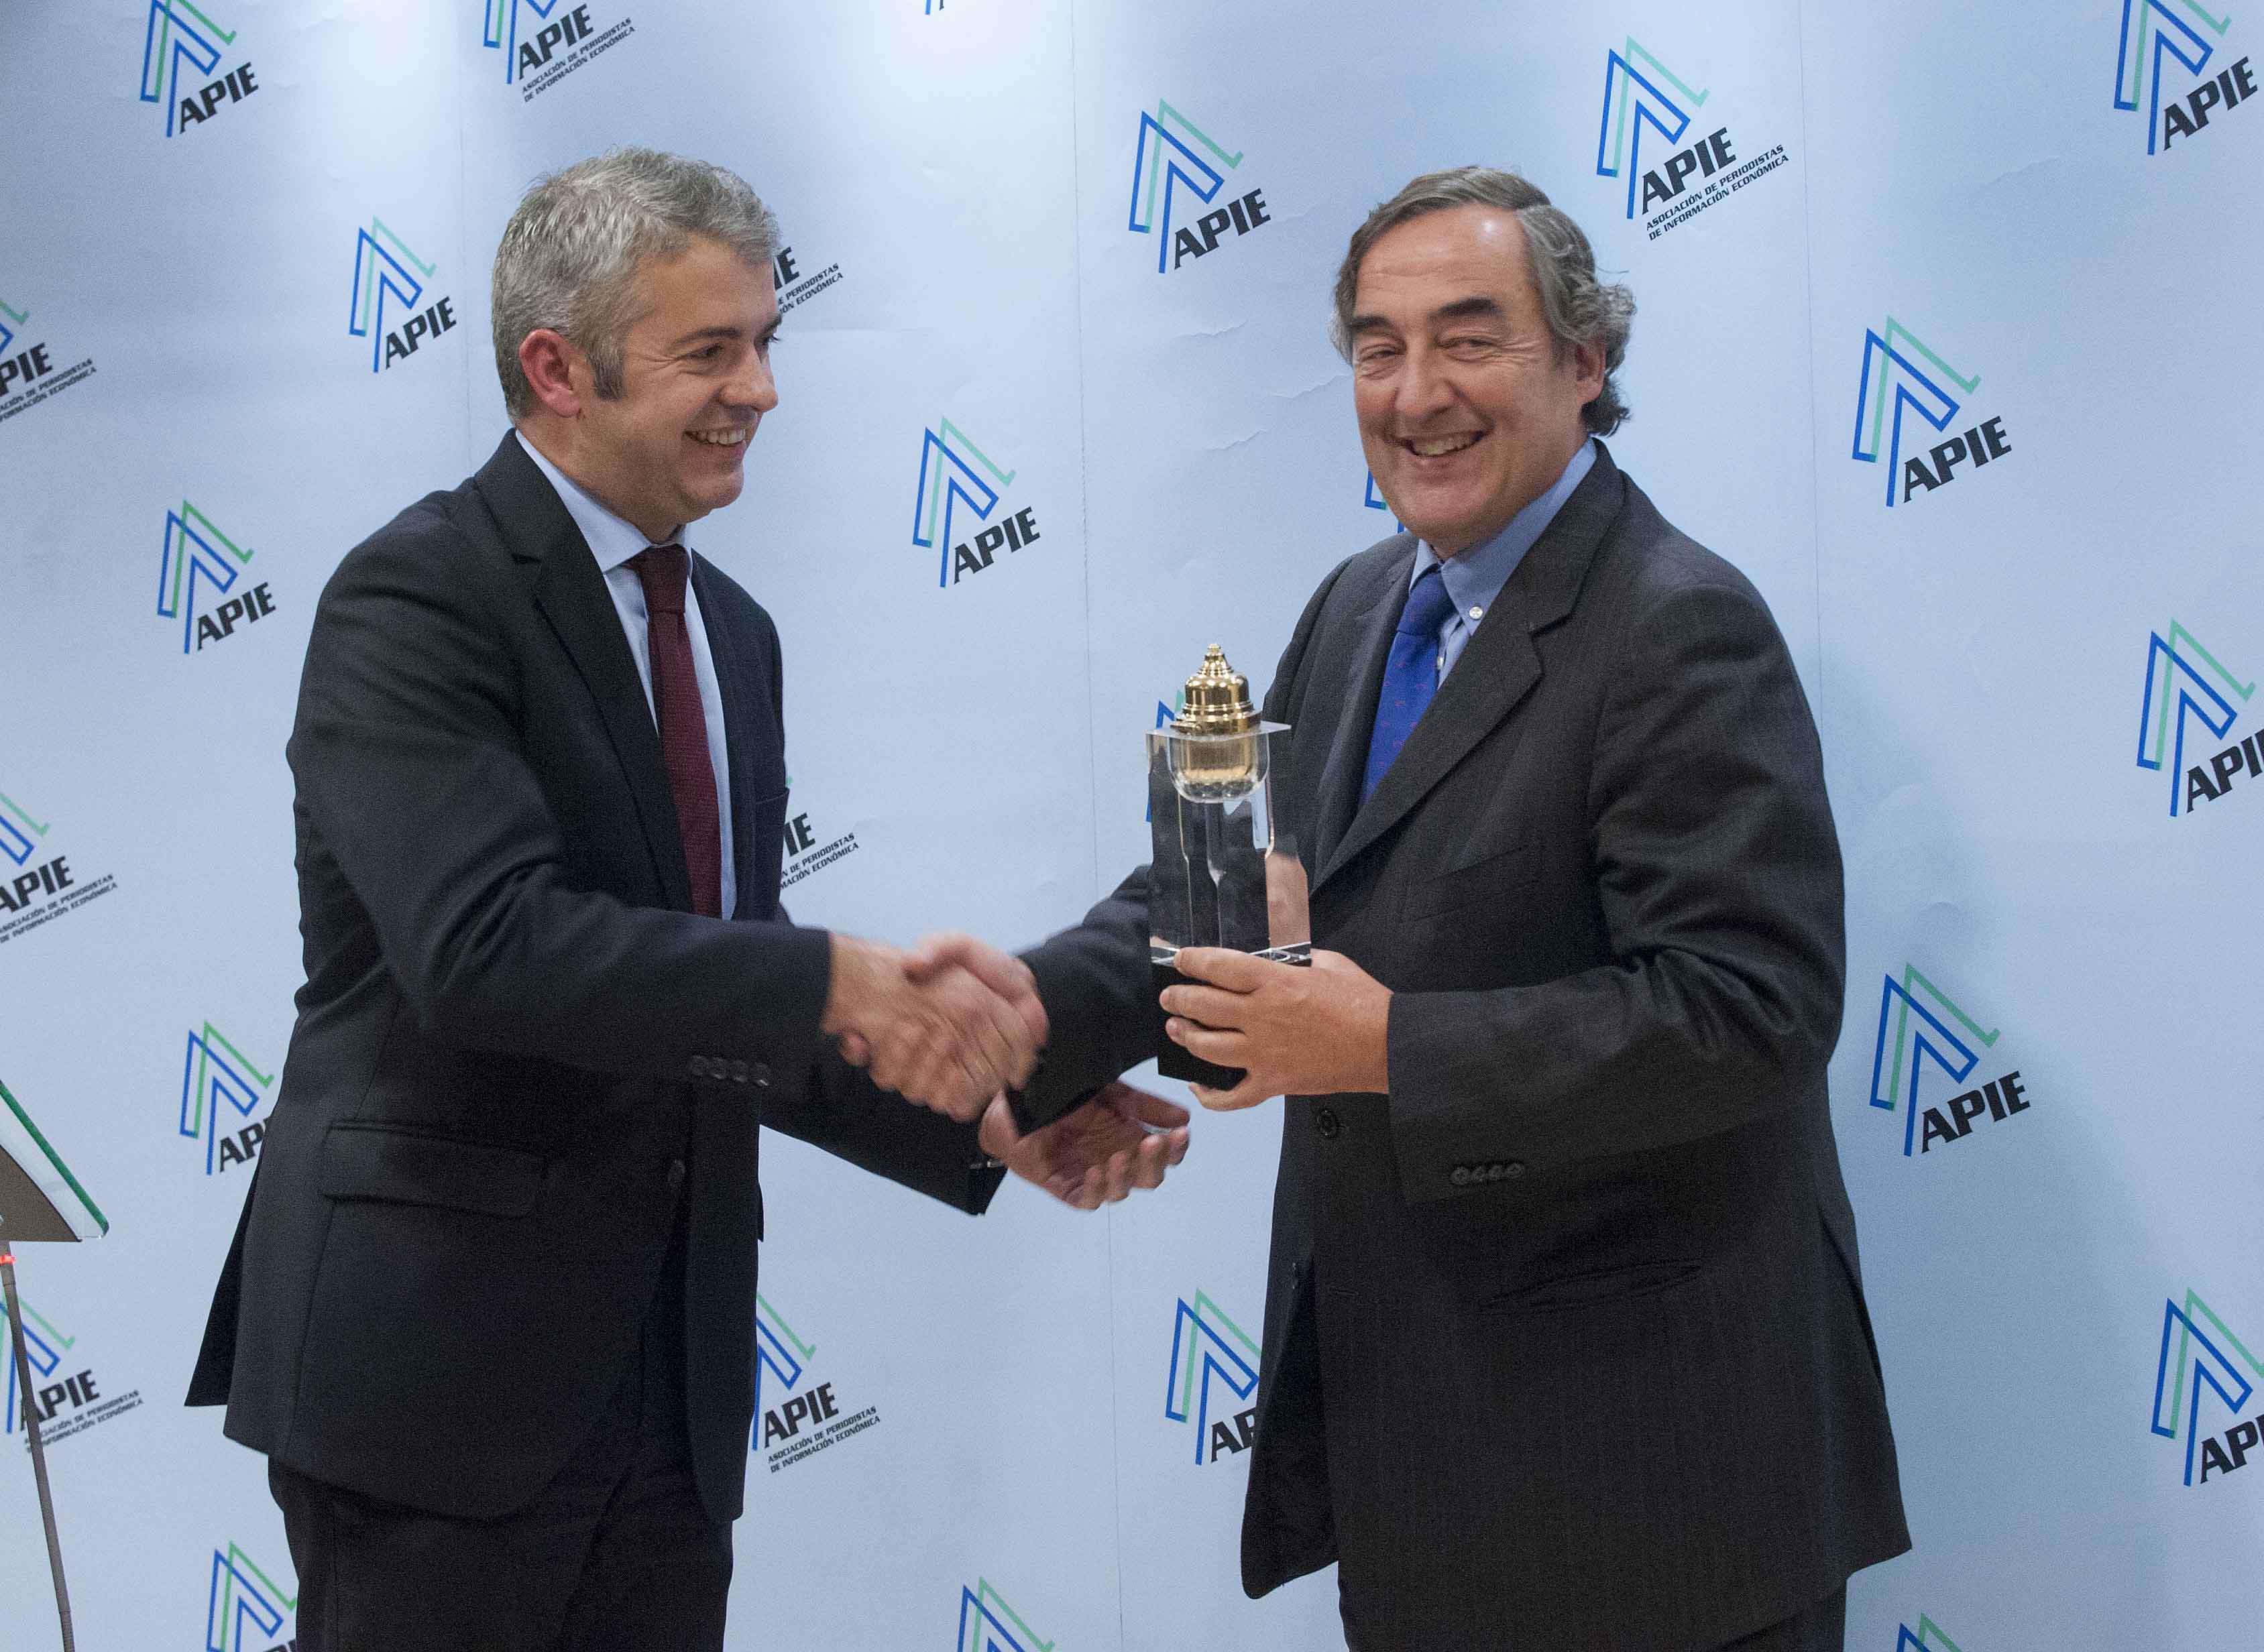 Javier García de la Vega, Presidente de APIE, hace entrega del premio Tintero a Juan Rosell, Presidente de la CEOE.